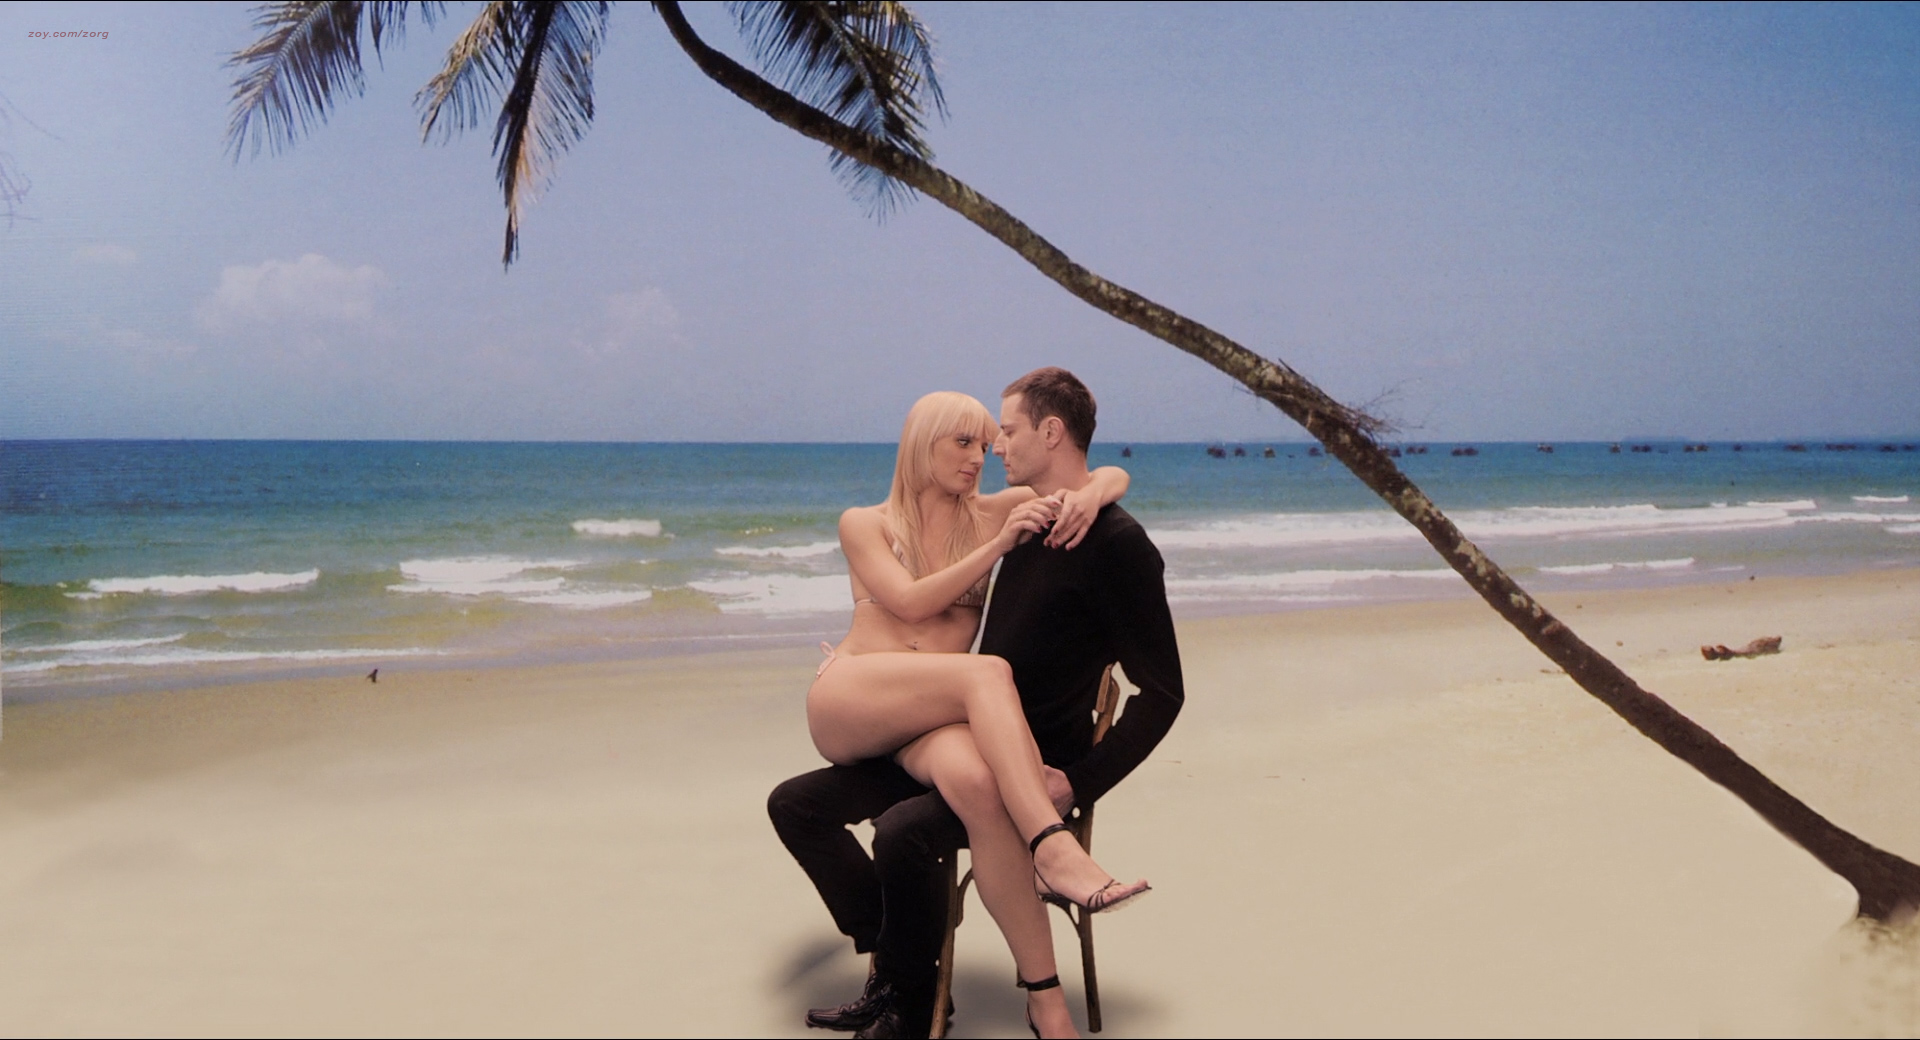 Ewa Matula nude busty boobs Karolina Korta hot others nude butt - Onirica (PL-2014) HD 1080p BluRay (2)